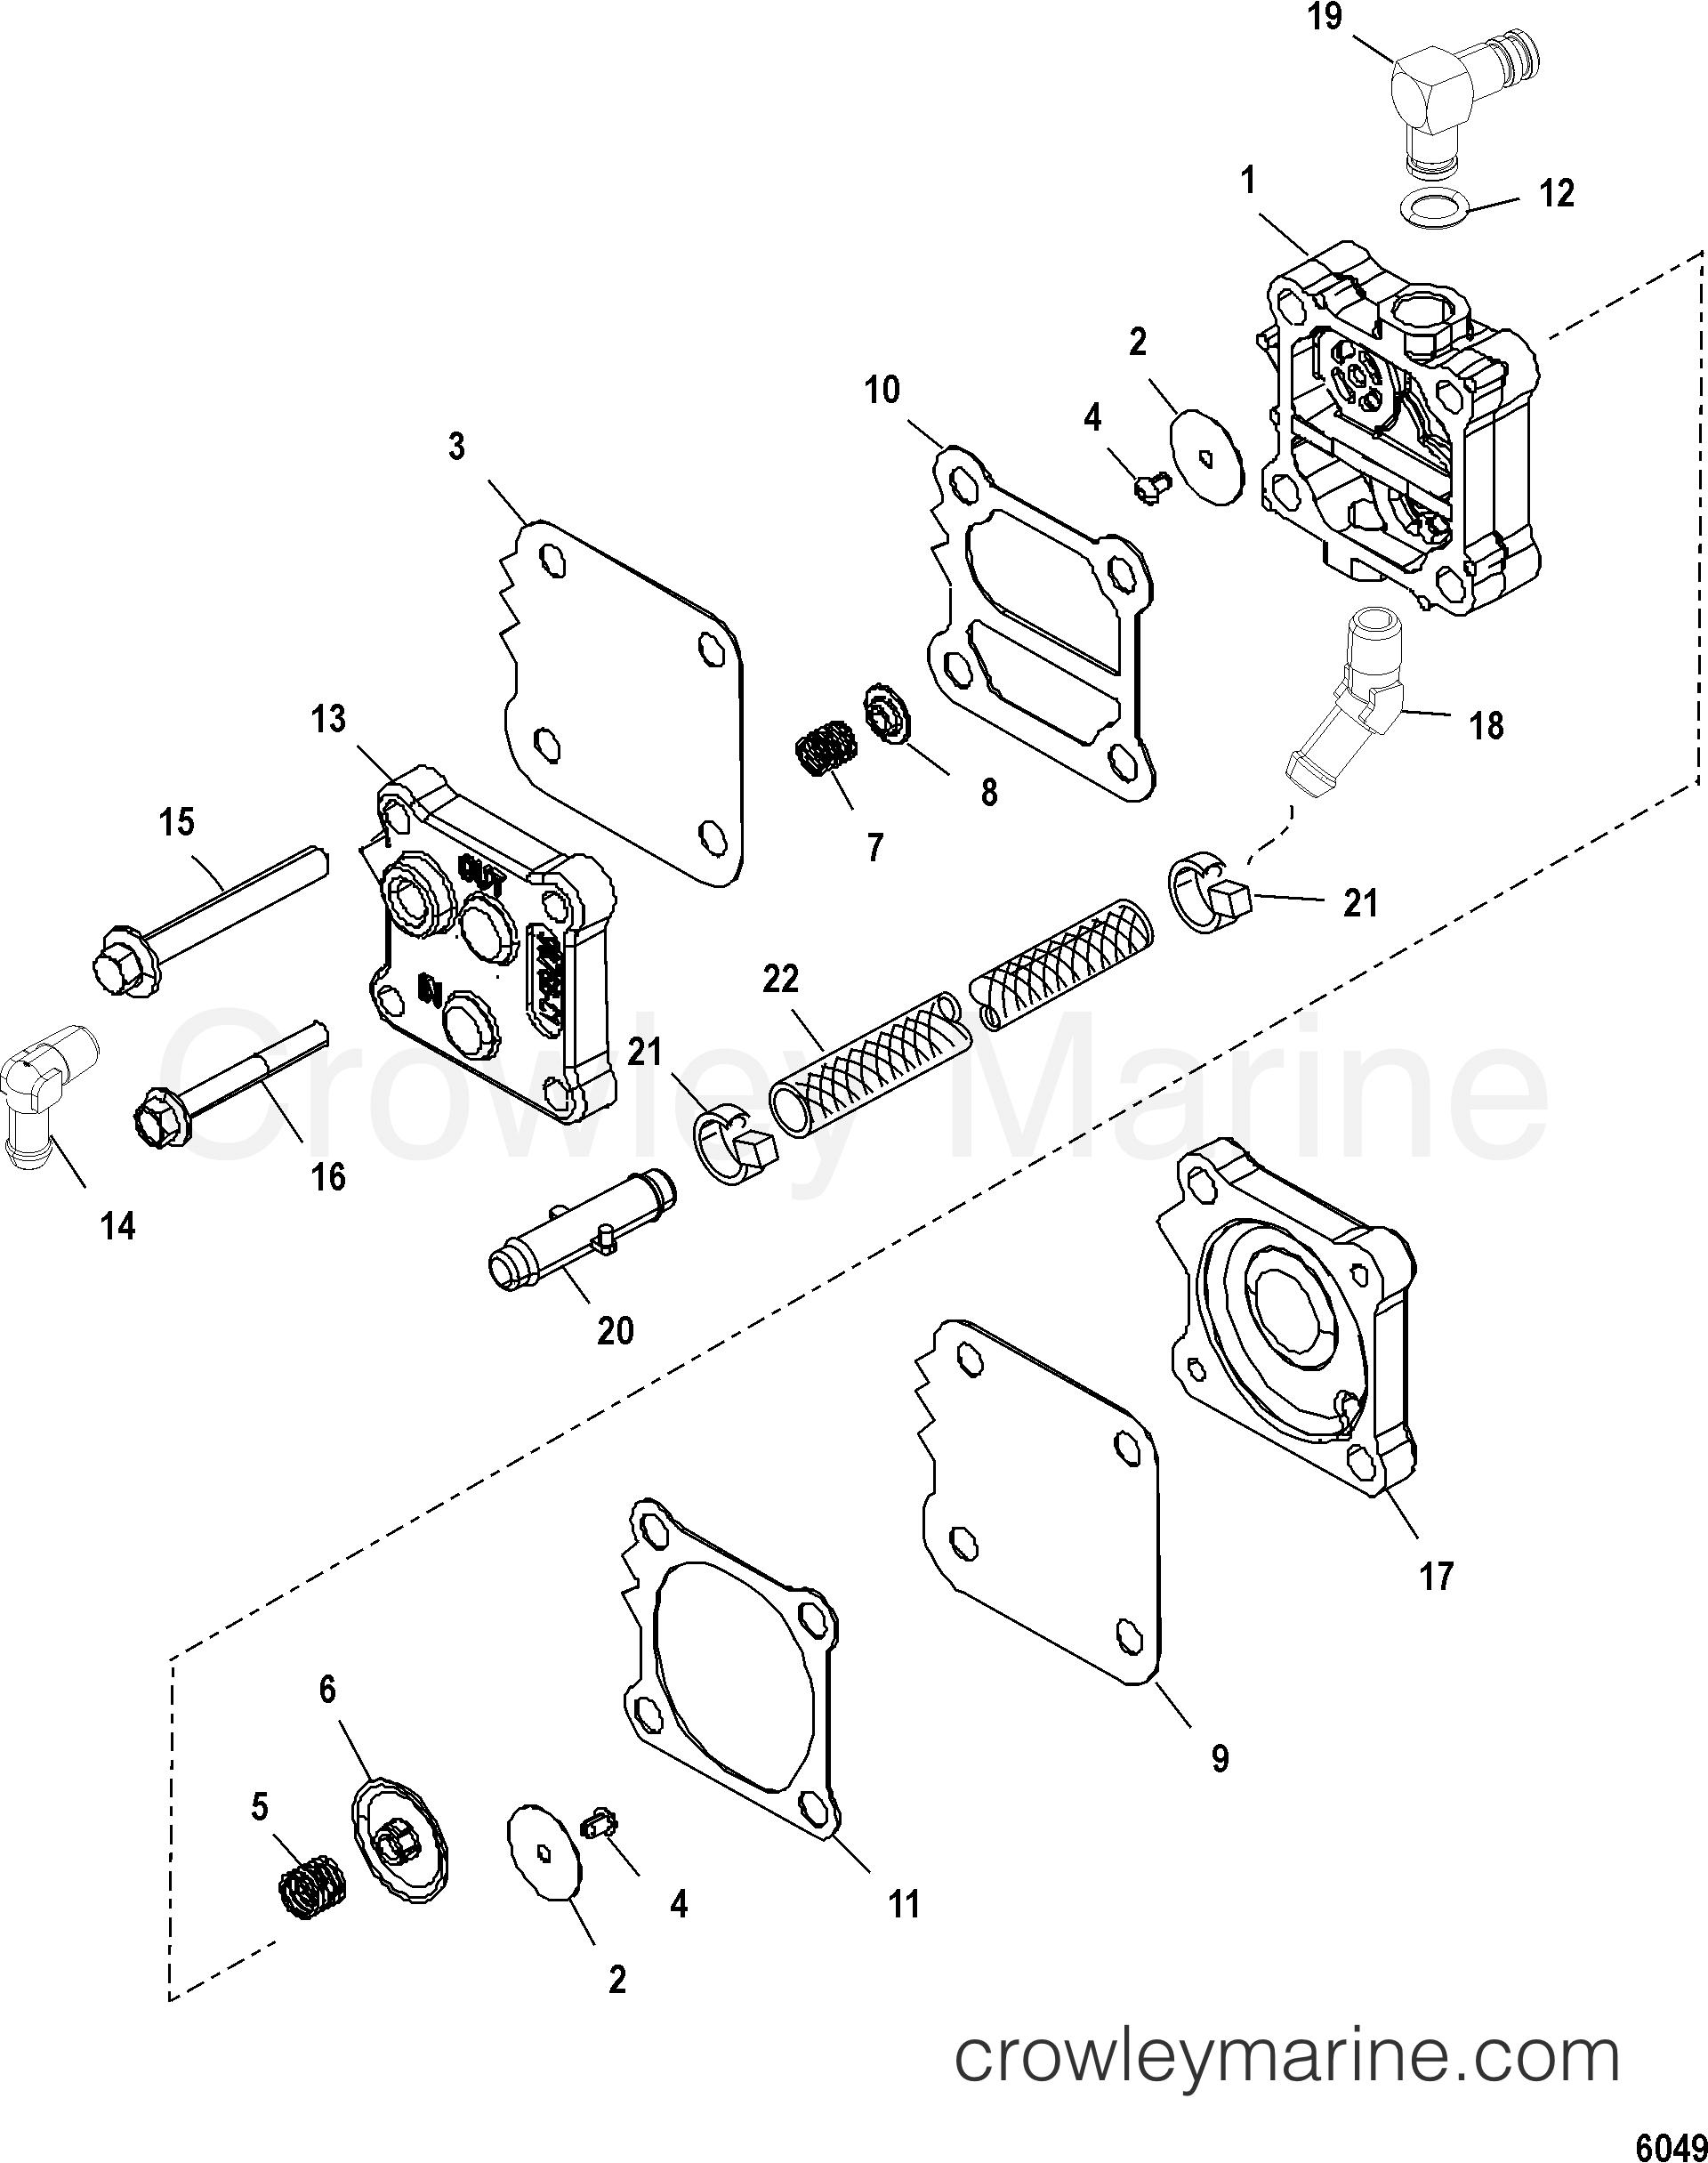 mercury 300xs wiring diagram oldlambourne co uk Venus Diagram mercury 300xs wiring diagram 19 20 stefvandenheuvel nl u2022 rh 19 20 stefvandenheuvel nl